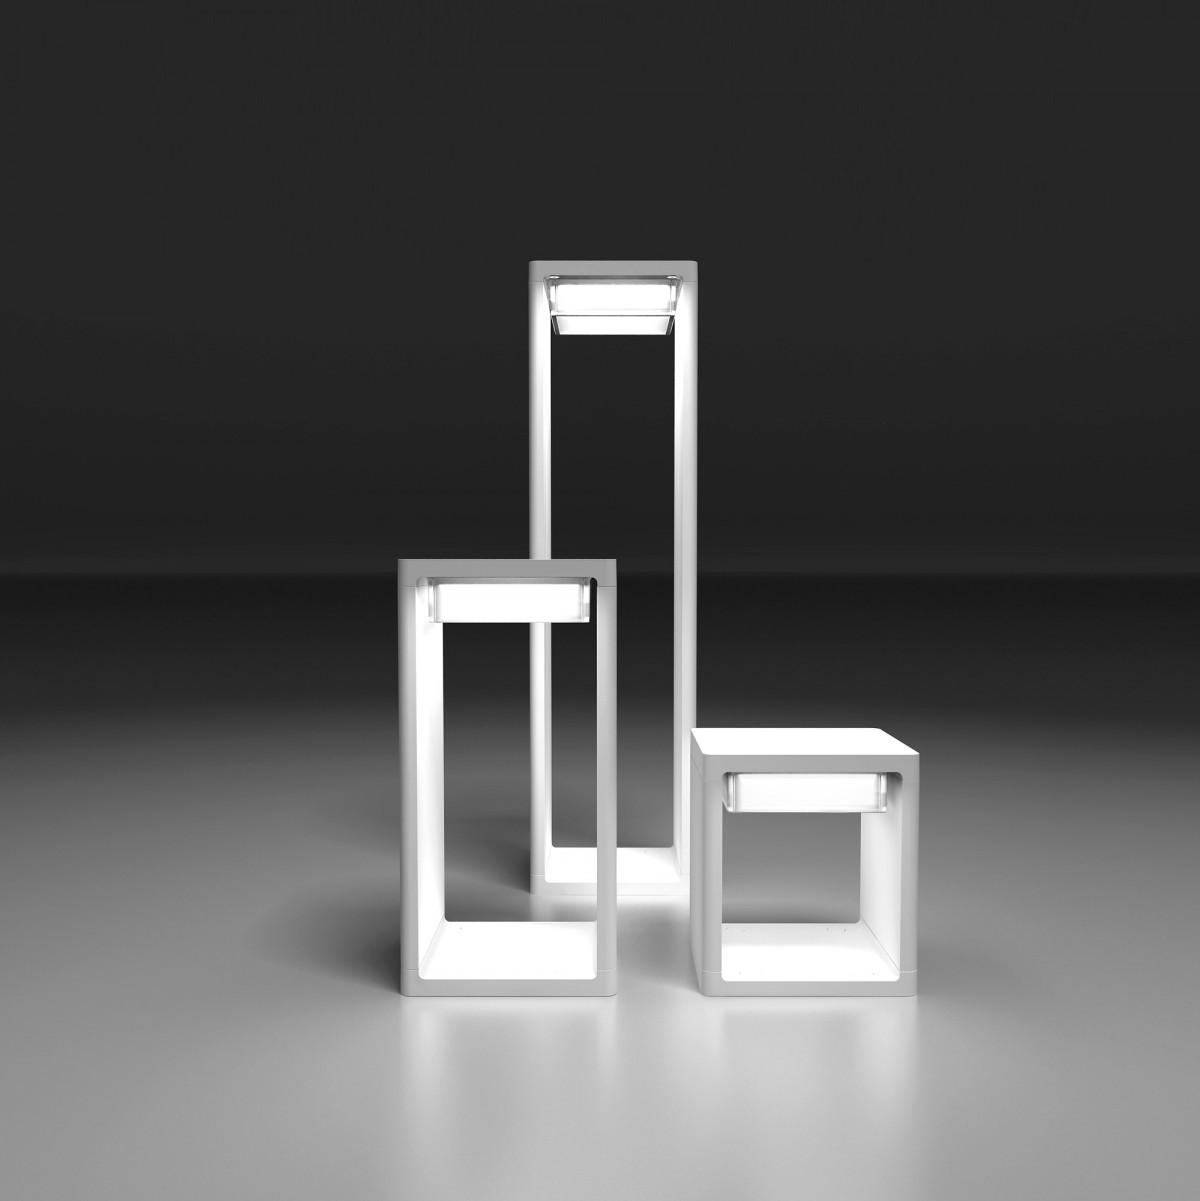 Frame M Balise Extérieure 2G7 2x7w - blanc